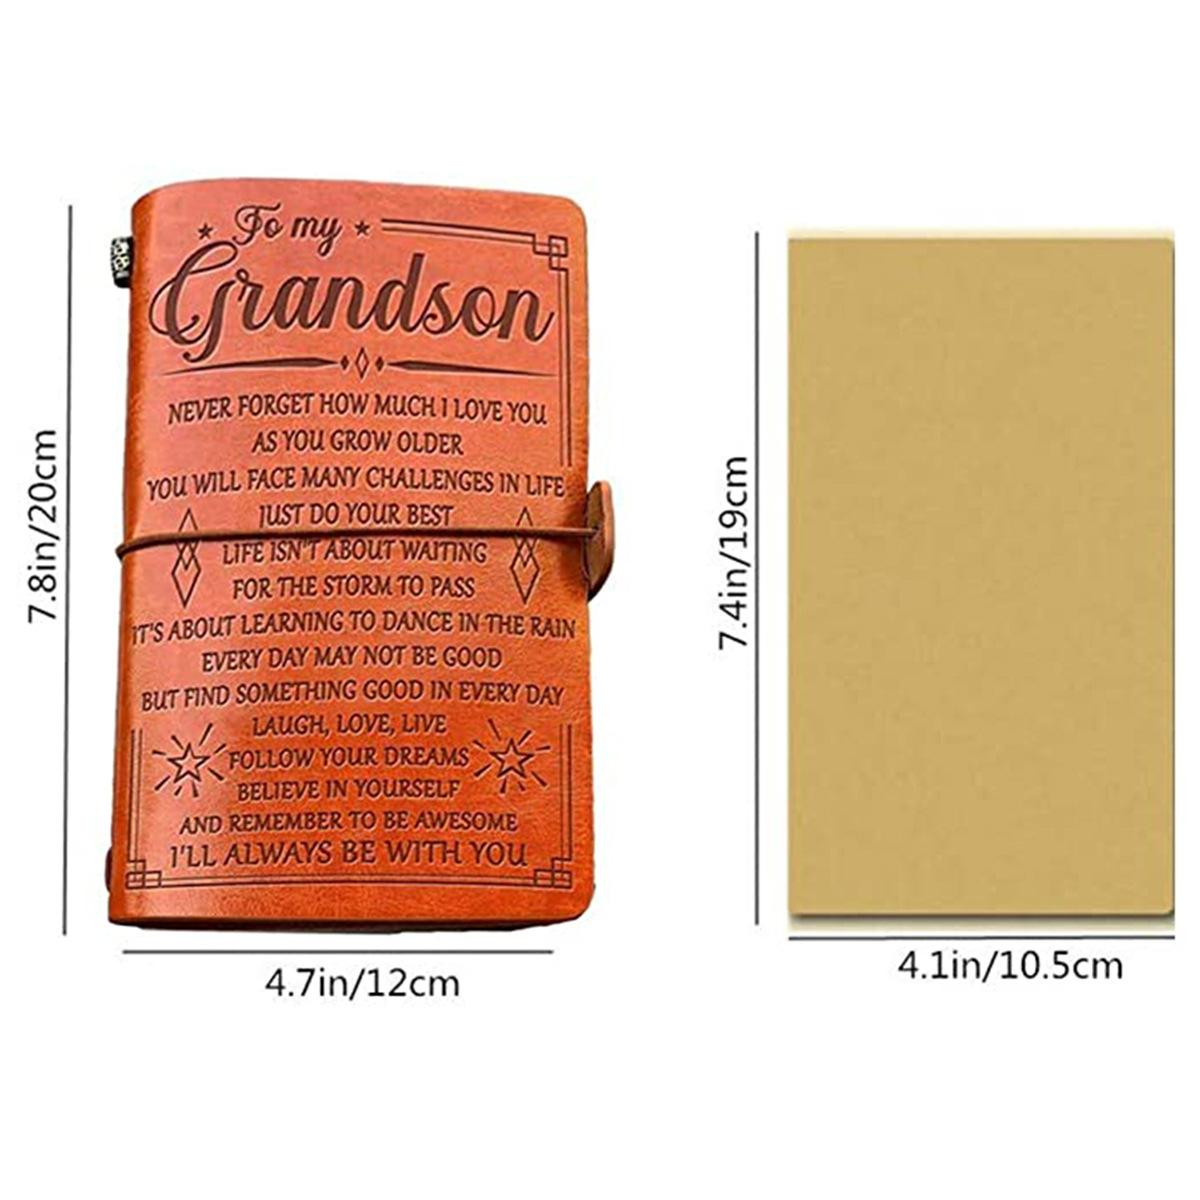 Notebook a mano antico, blocco note in pelle retrò Blocco note, semplice Blocco note da regalo